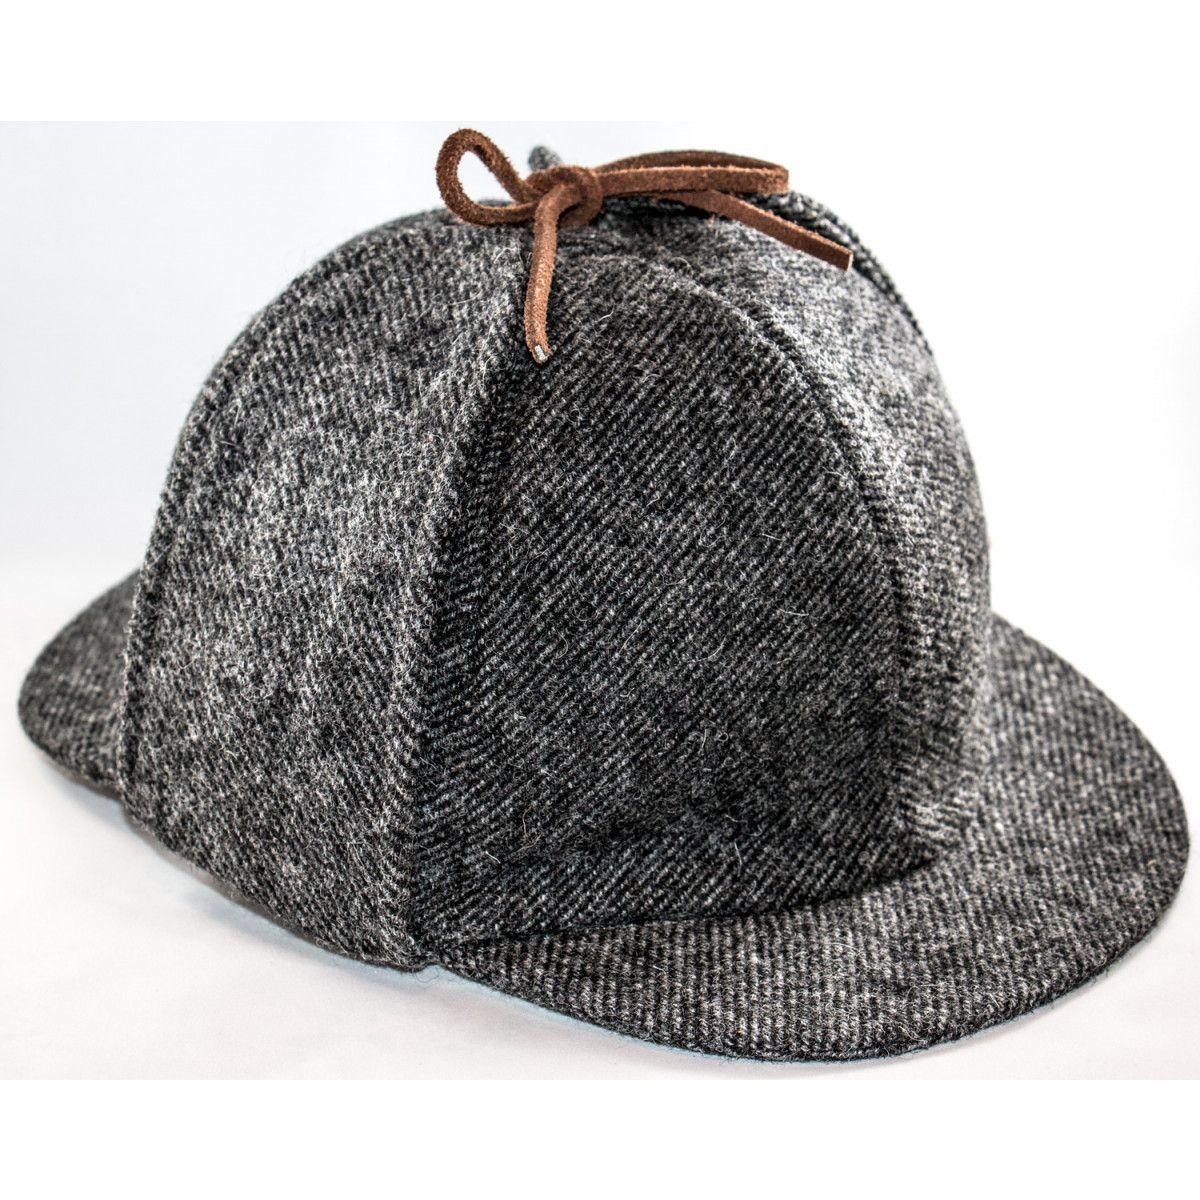 "5a83e856471 Deerstalker Hat  Grey Tweed - ""Put the hat on!"" According to Dr ..."